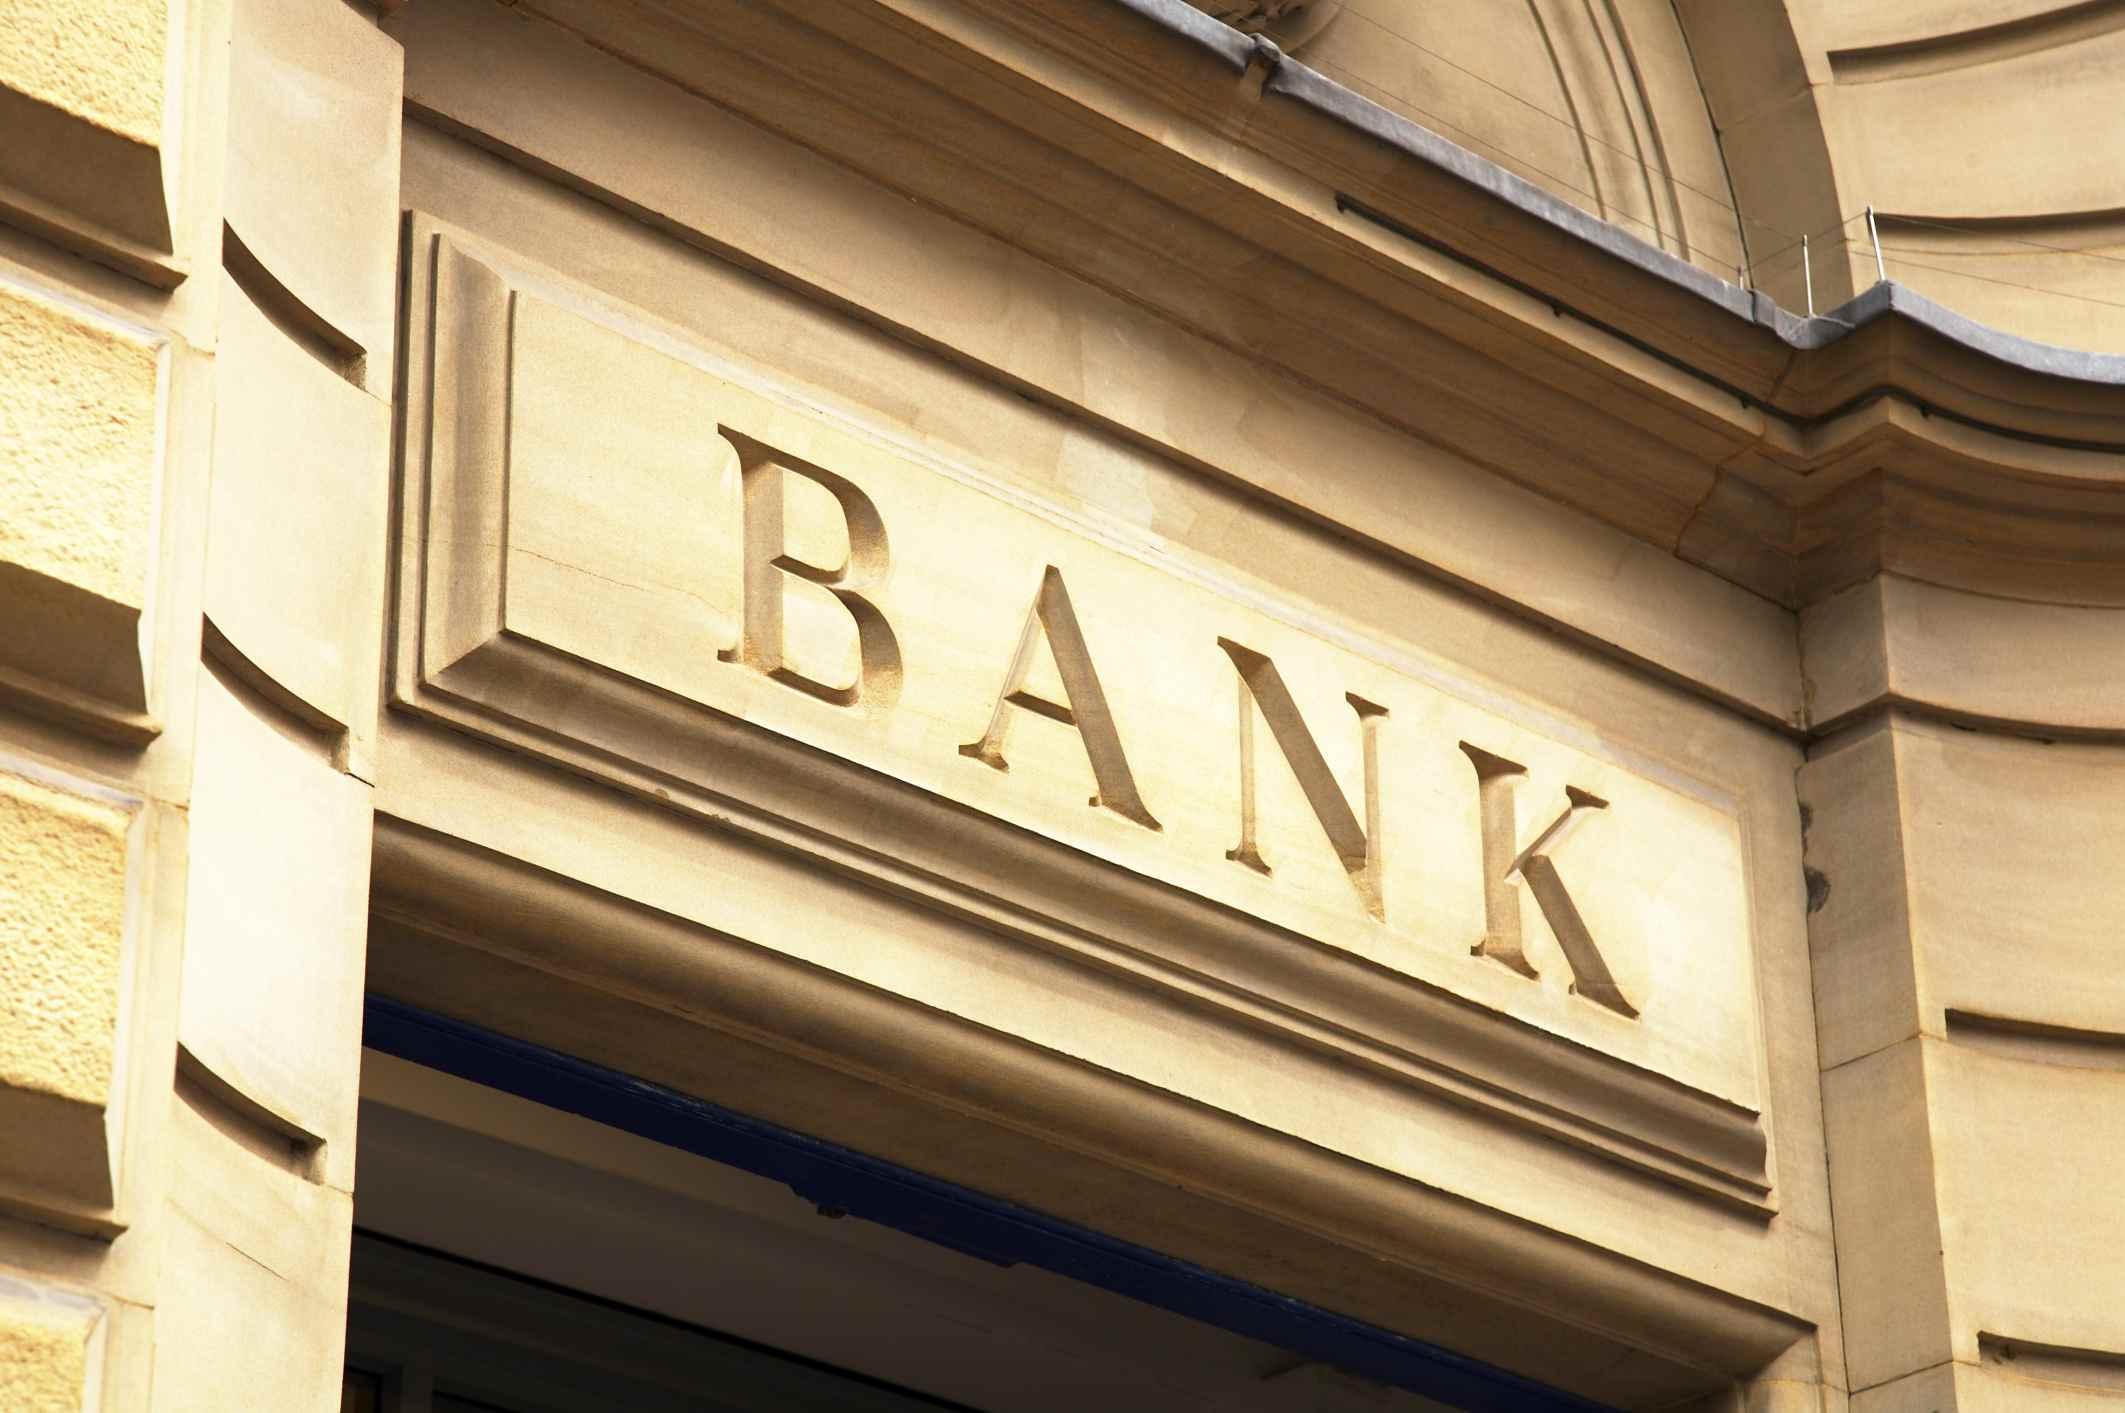 Pengertian Bank Sentral, Fungsi Beserta Serba-Serbinya